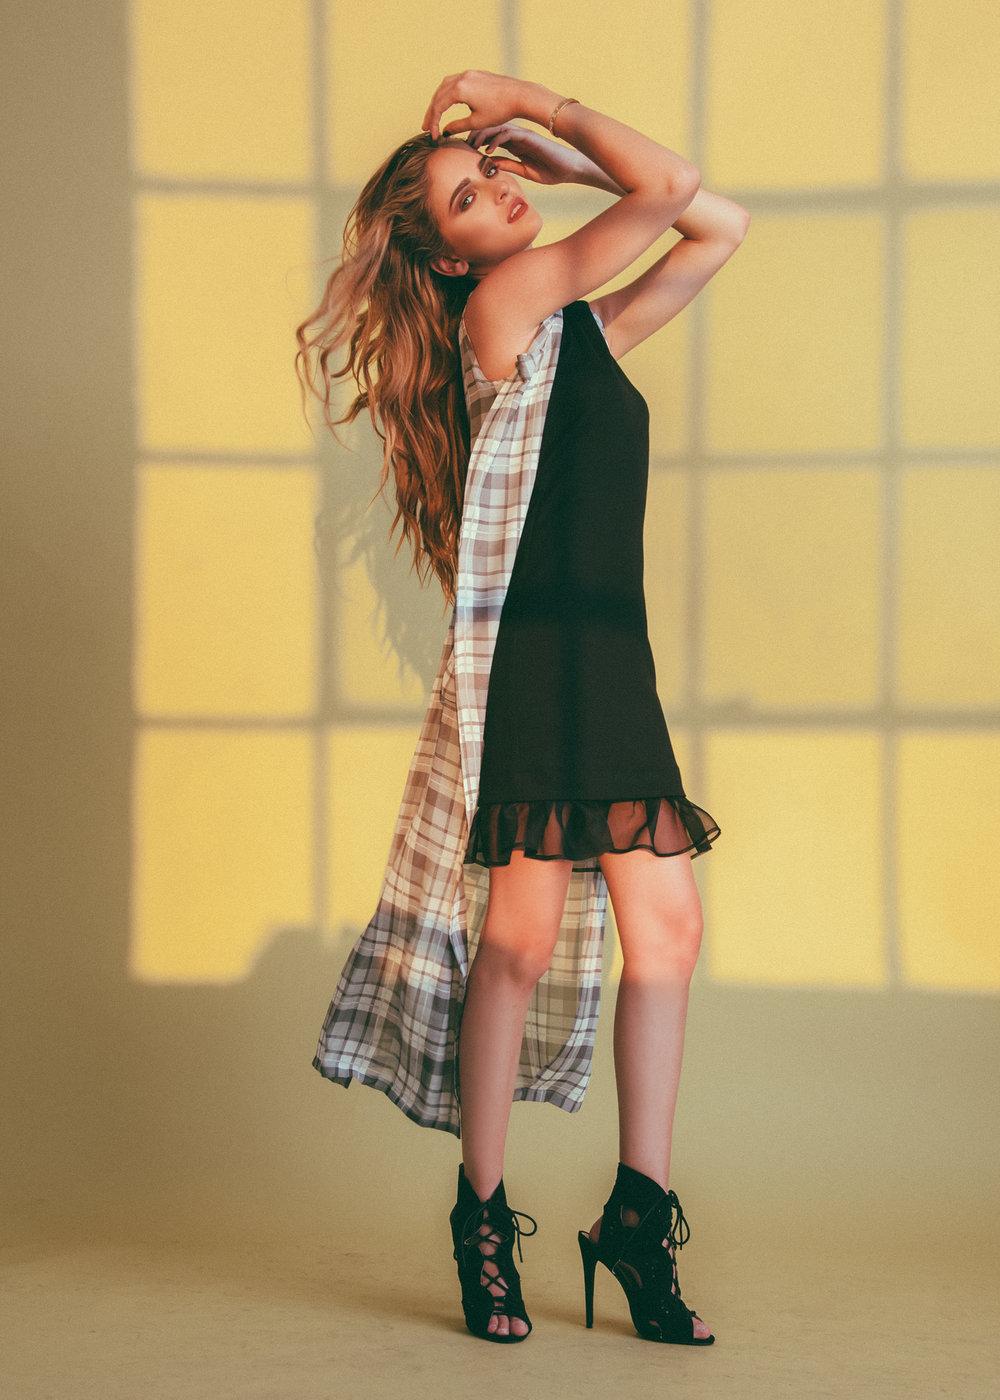 jessica-faulkner-spring-fashion-clothing-women.jpg